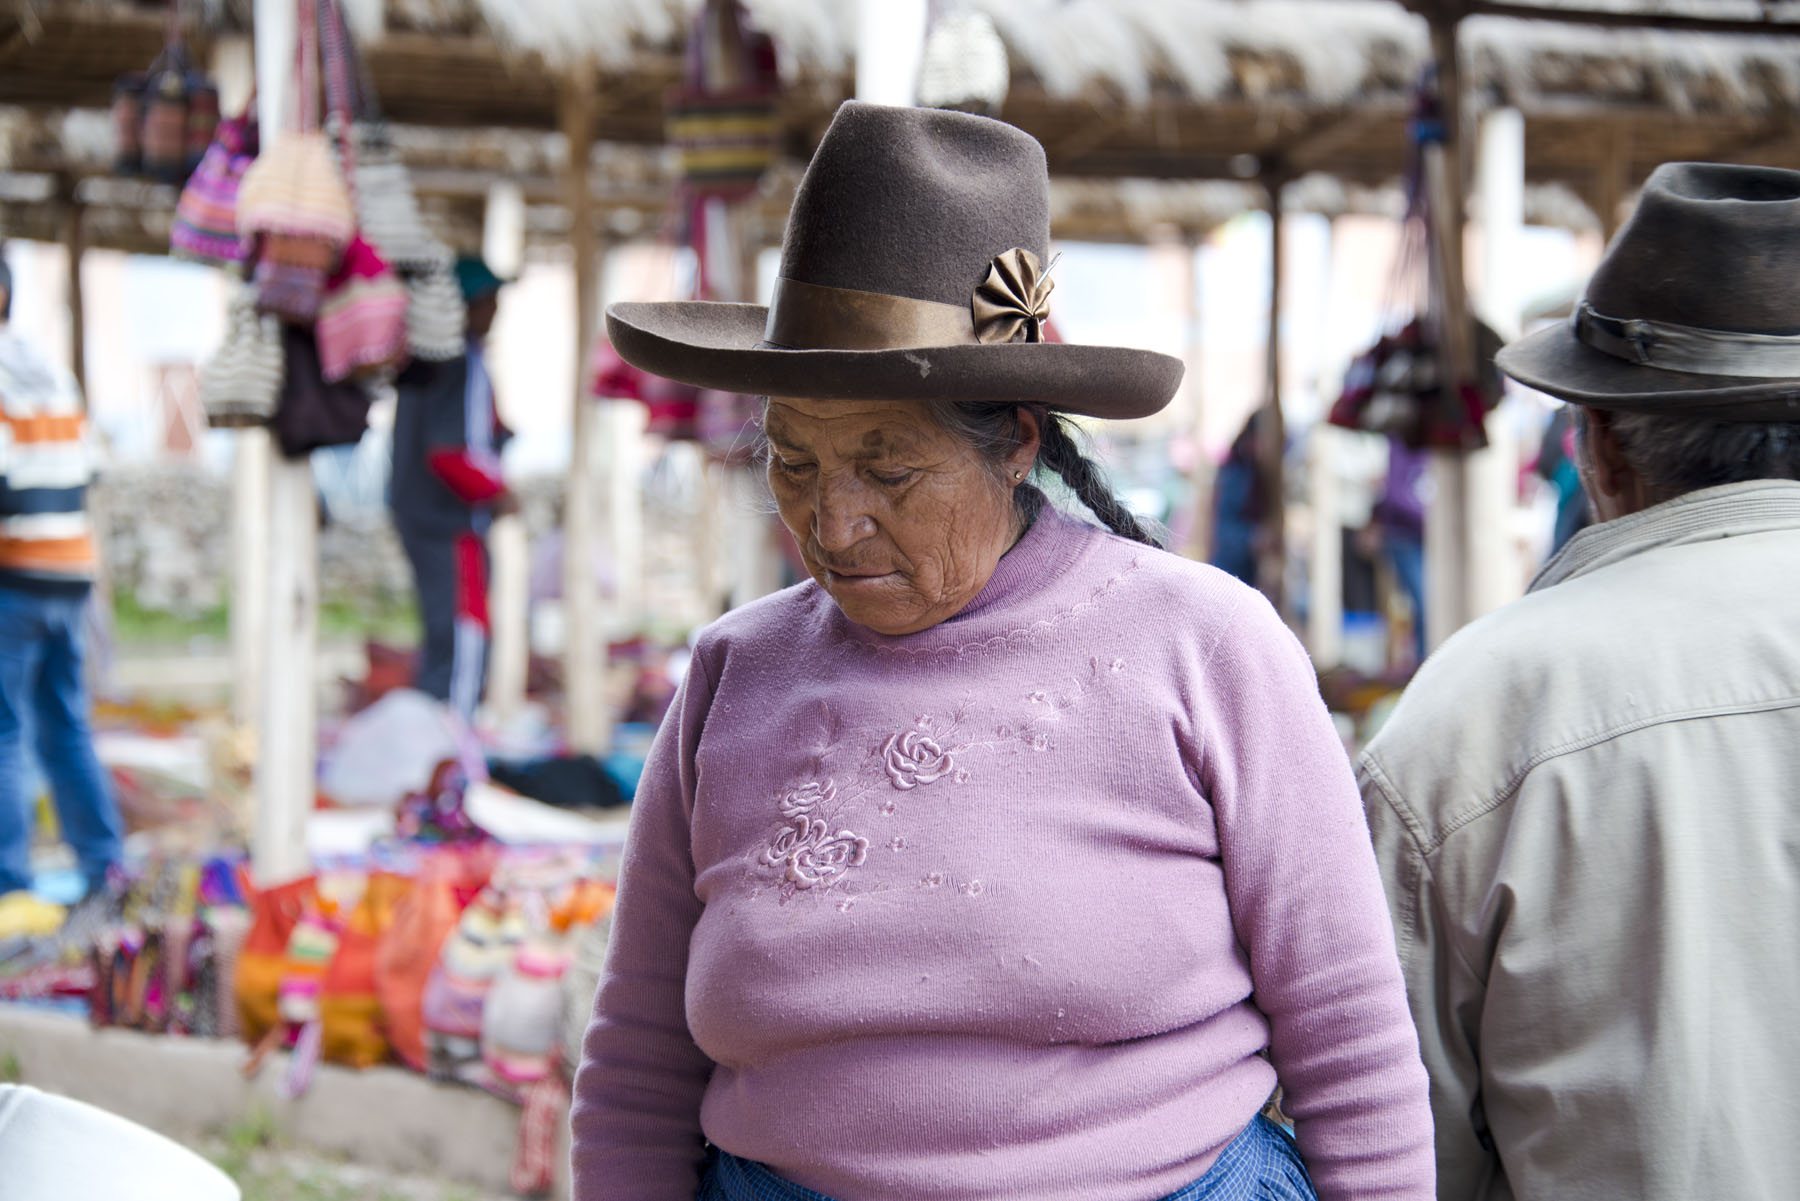 071-Peru-5-15.jpg